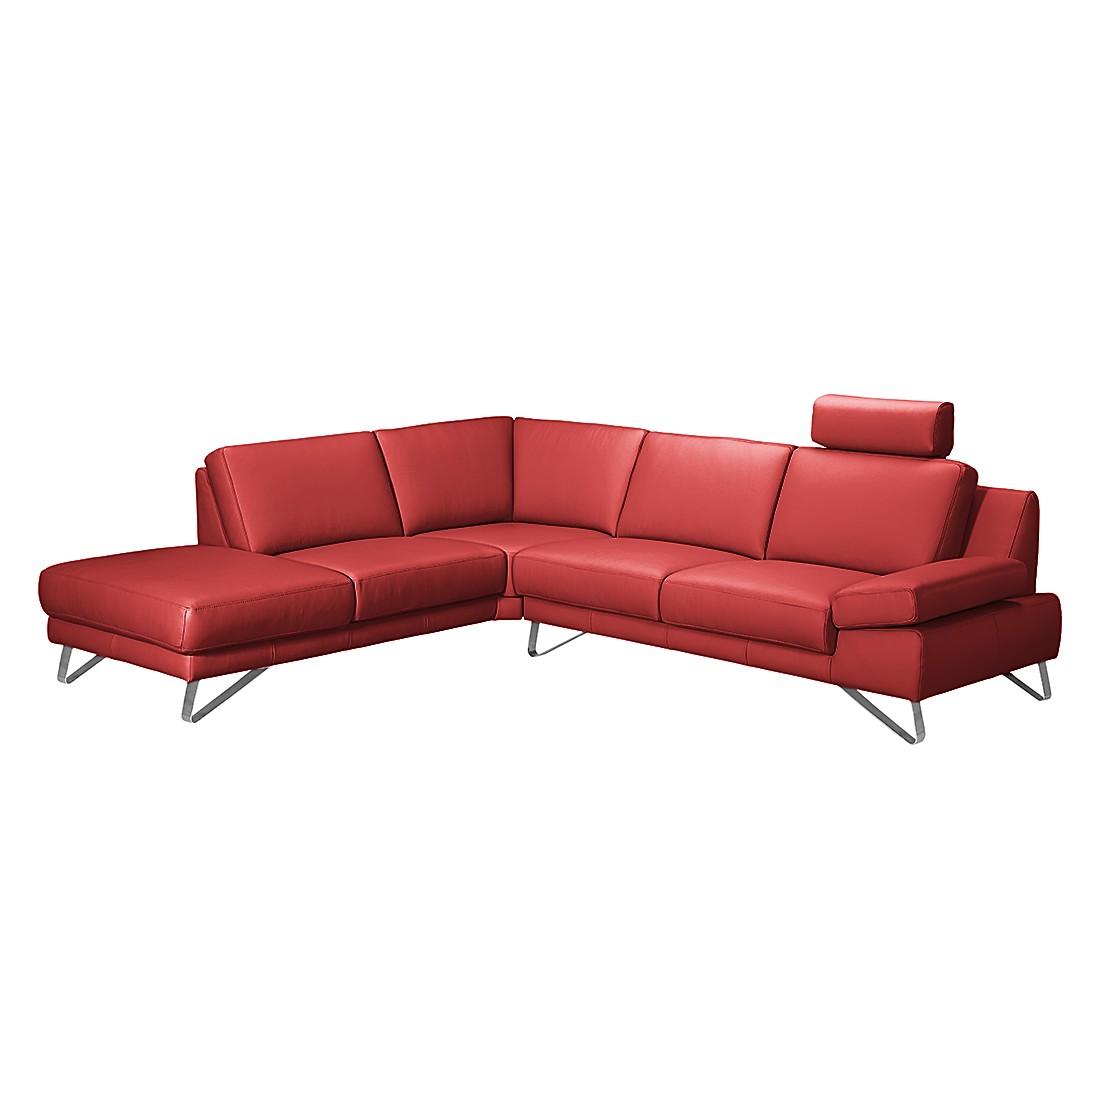 ecksofa retro inspirierendes design f r wohnm bel. Black Bedroom Furniture Sets. Home Design Ideas